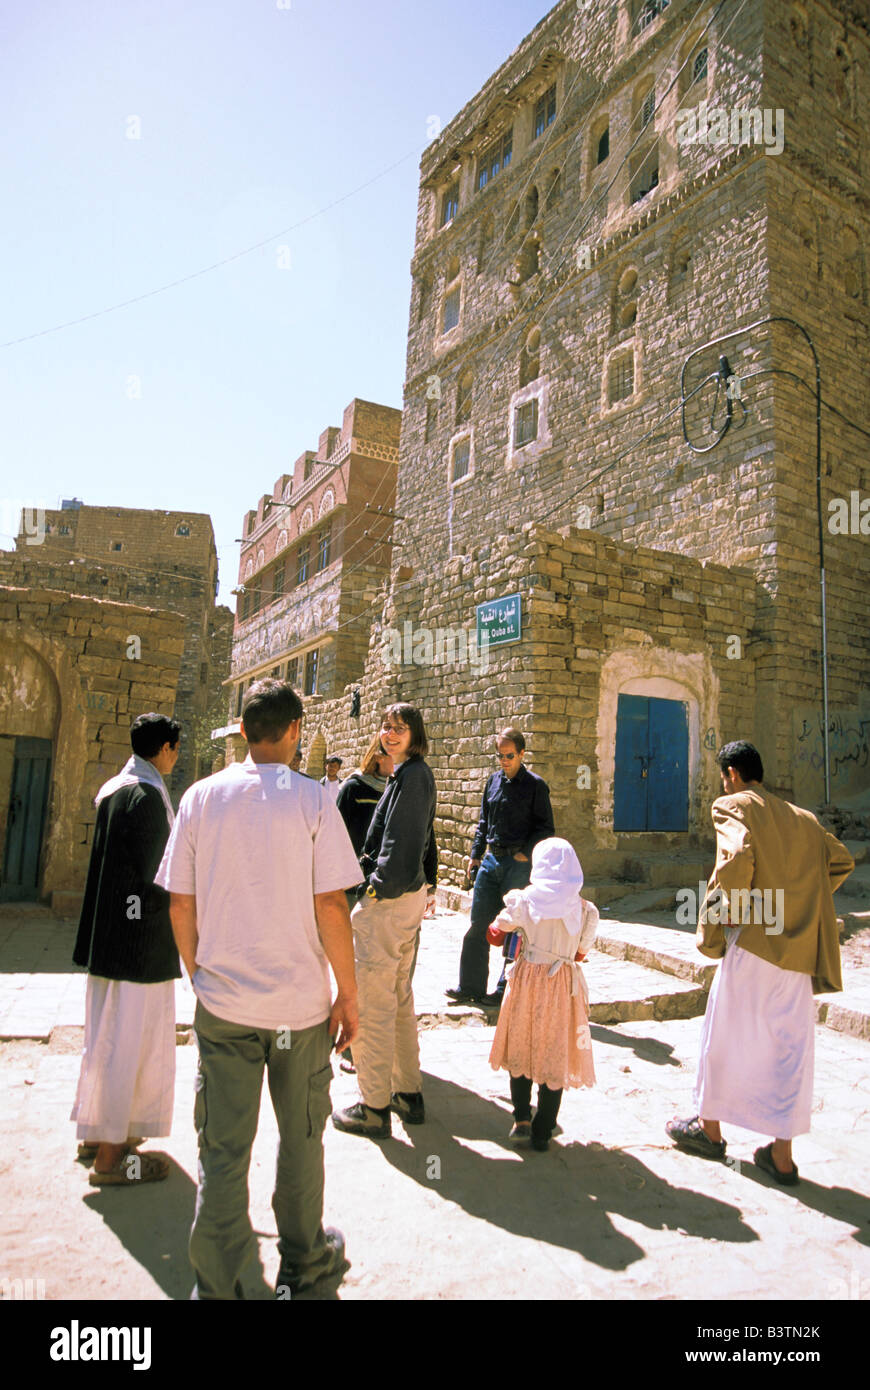 Asia, Yemen, Thilla. Visitors. - Stock Image